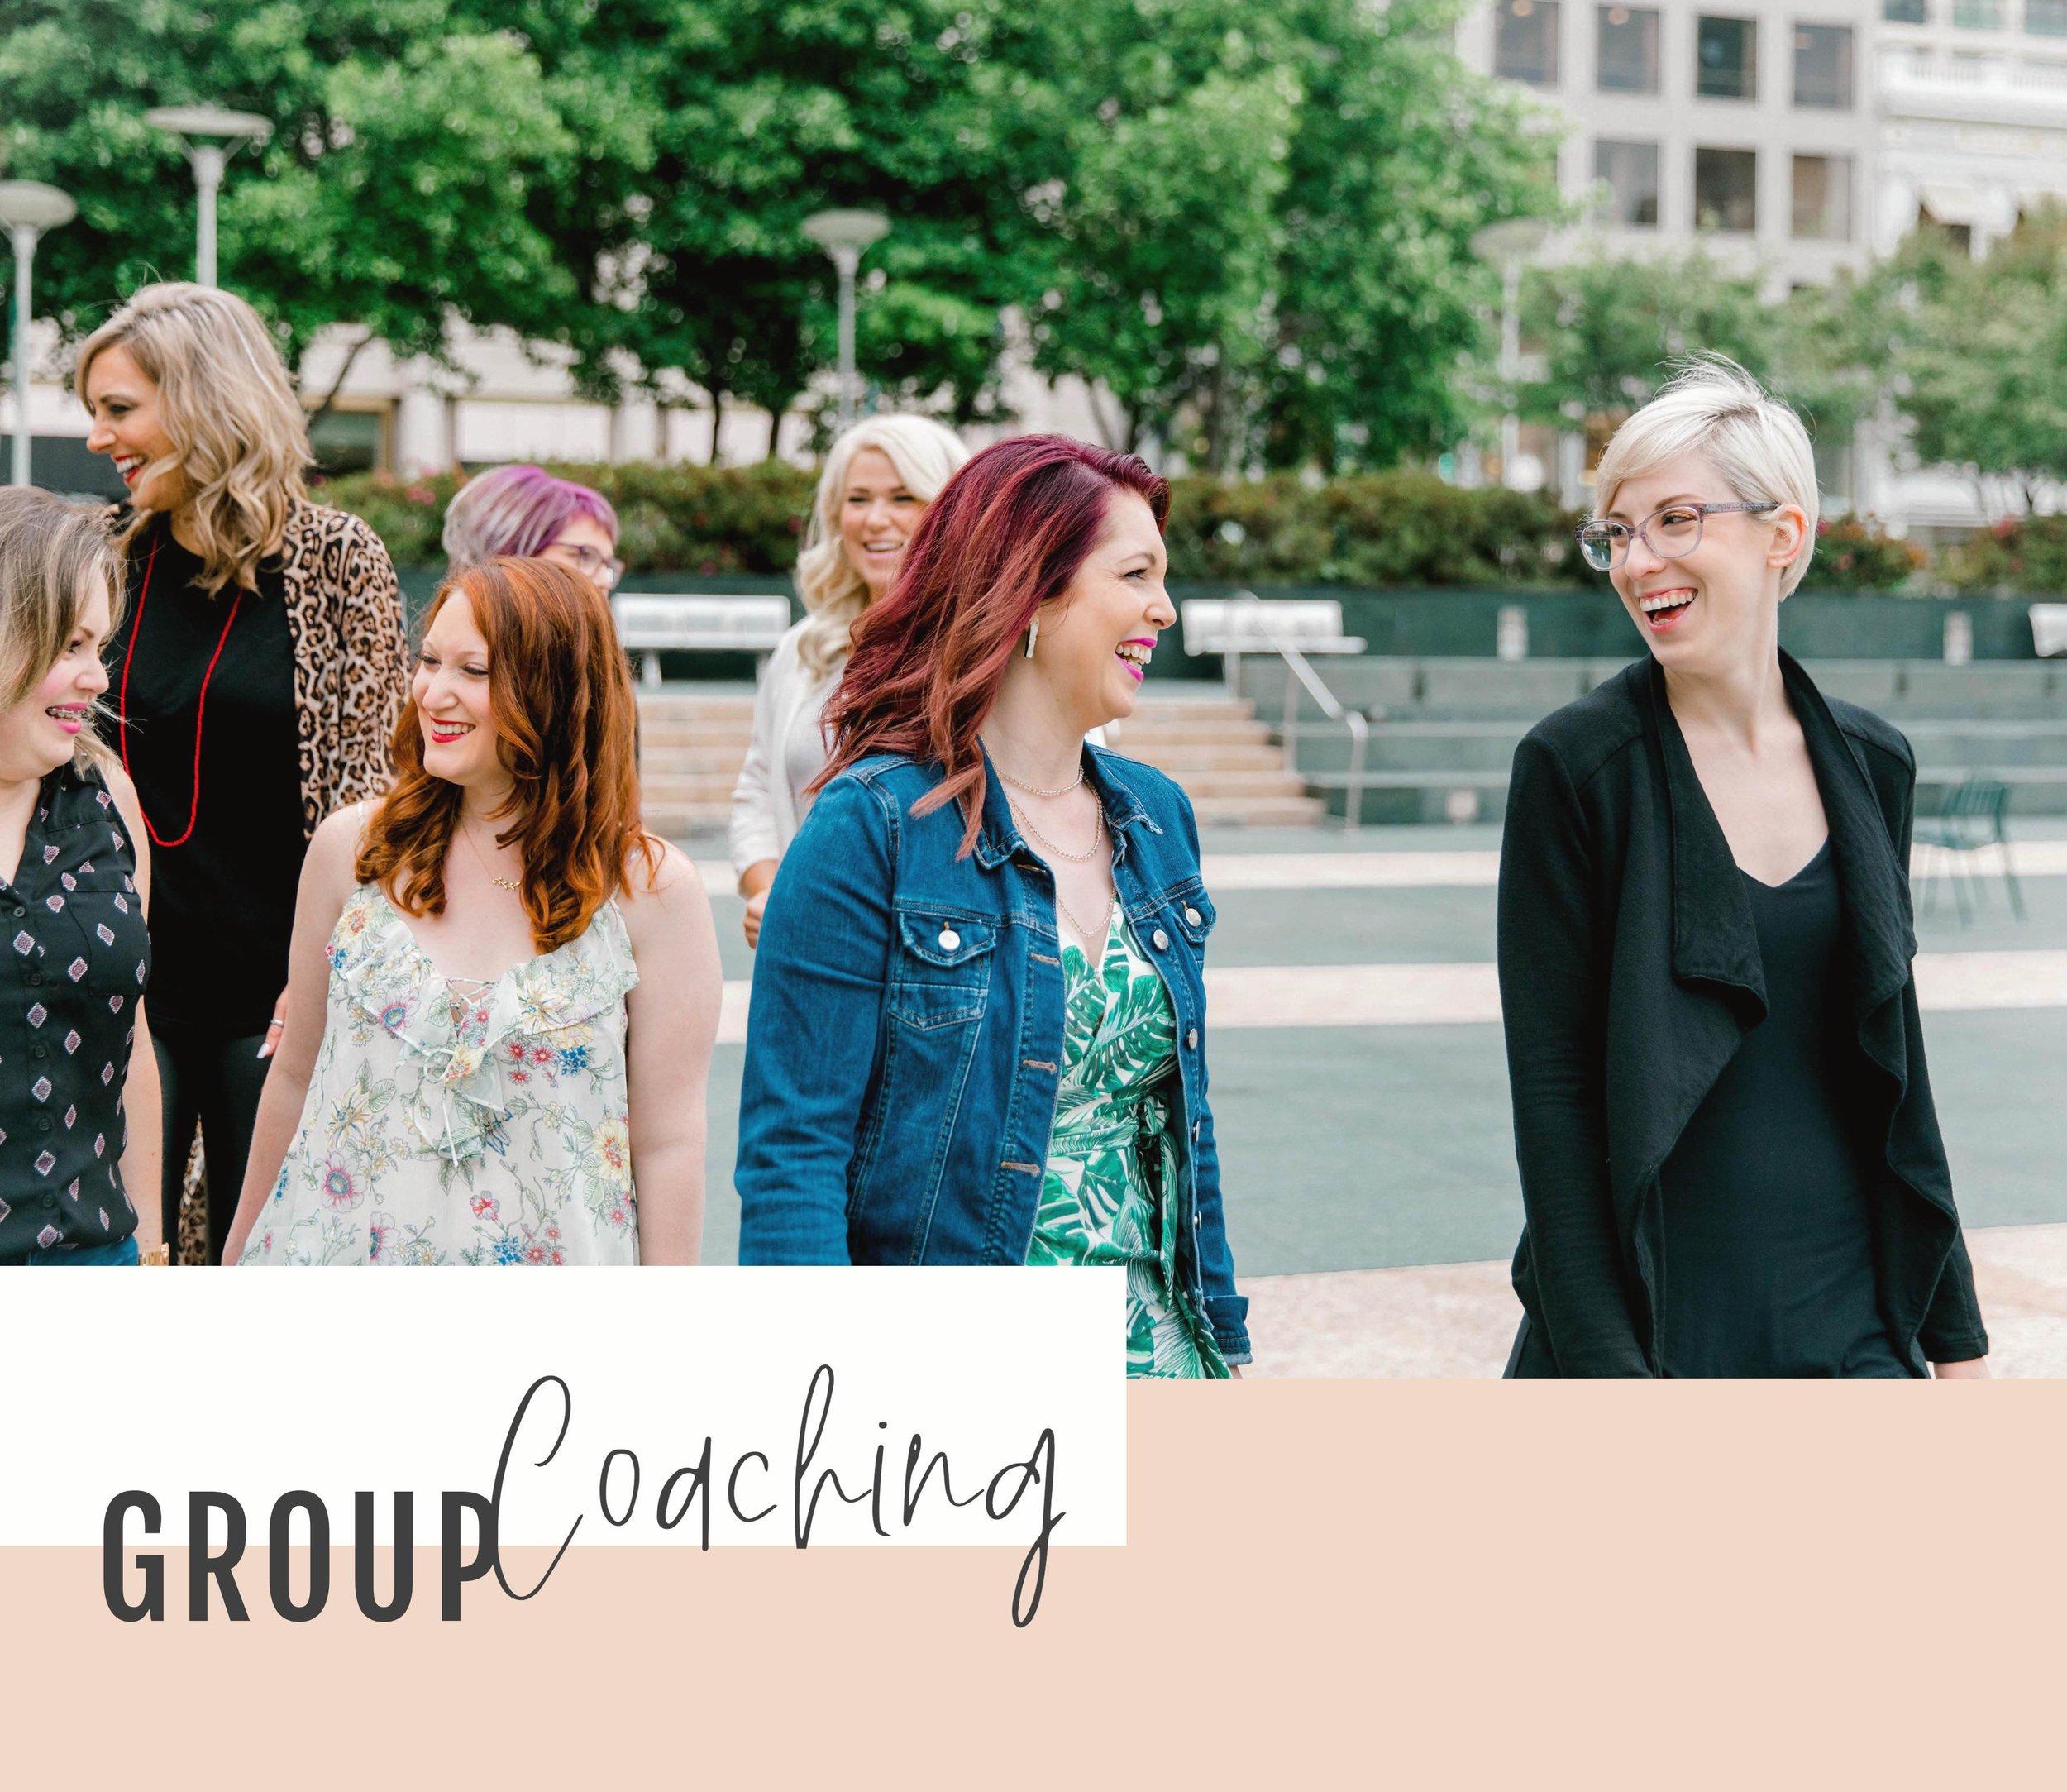 groupcoaching copy.jpg